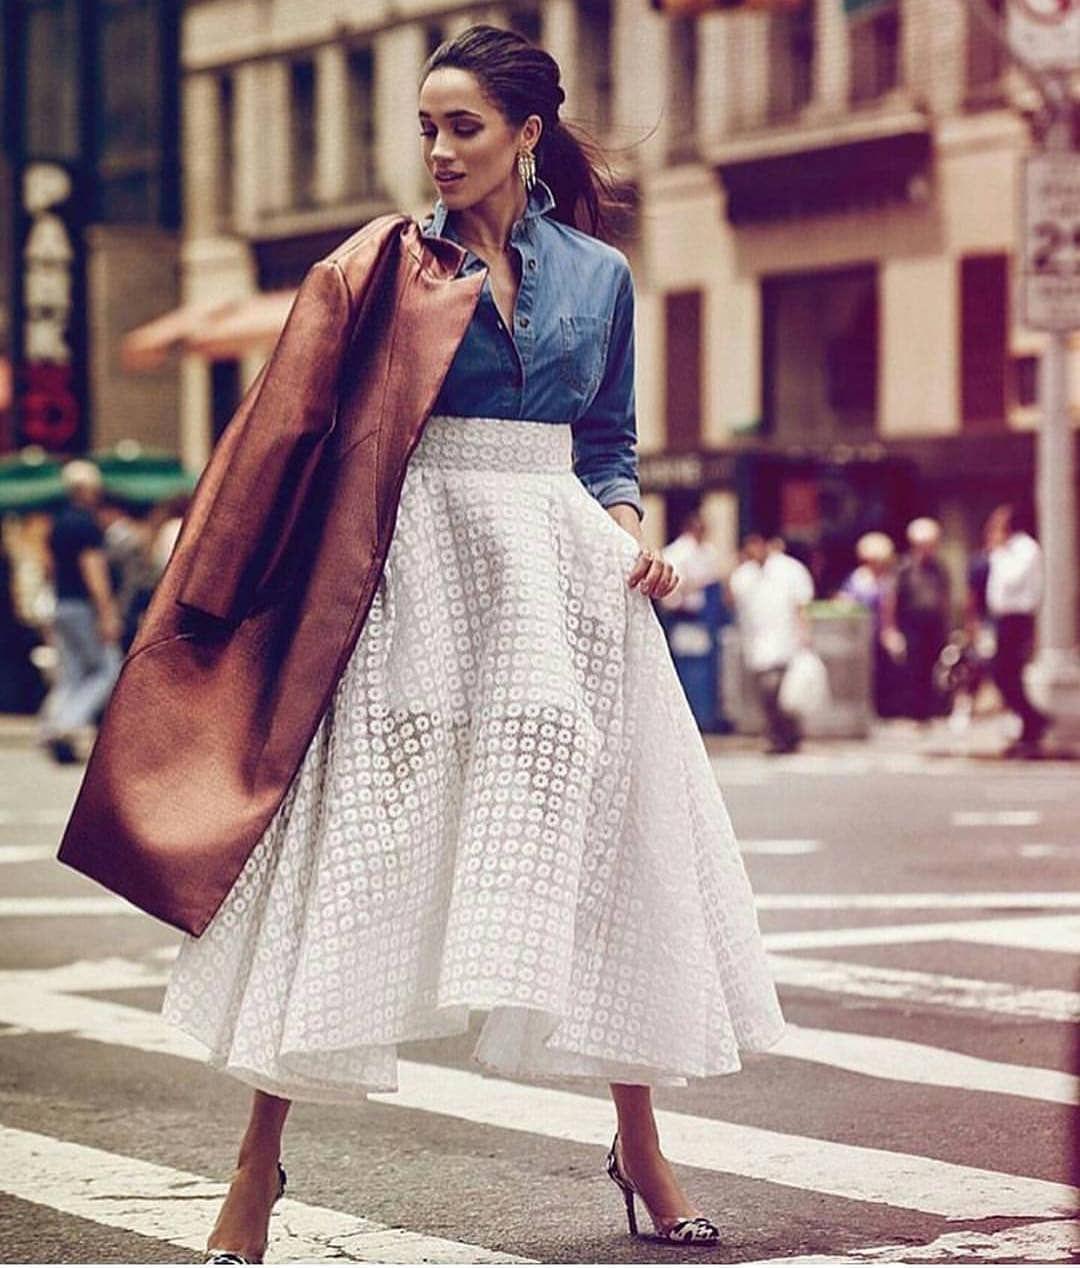 Fashion Beauty And Lifestyle Blogs: Fashion, Life & Style Blog (@lifestylecatcher) En